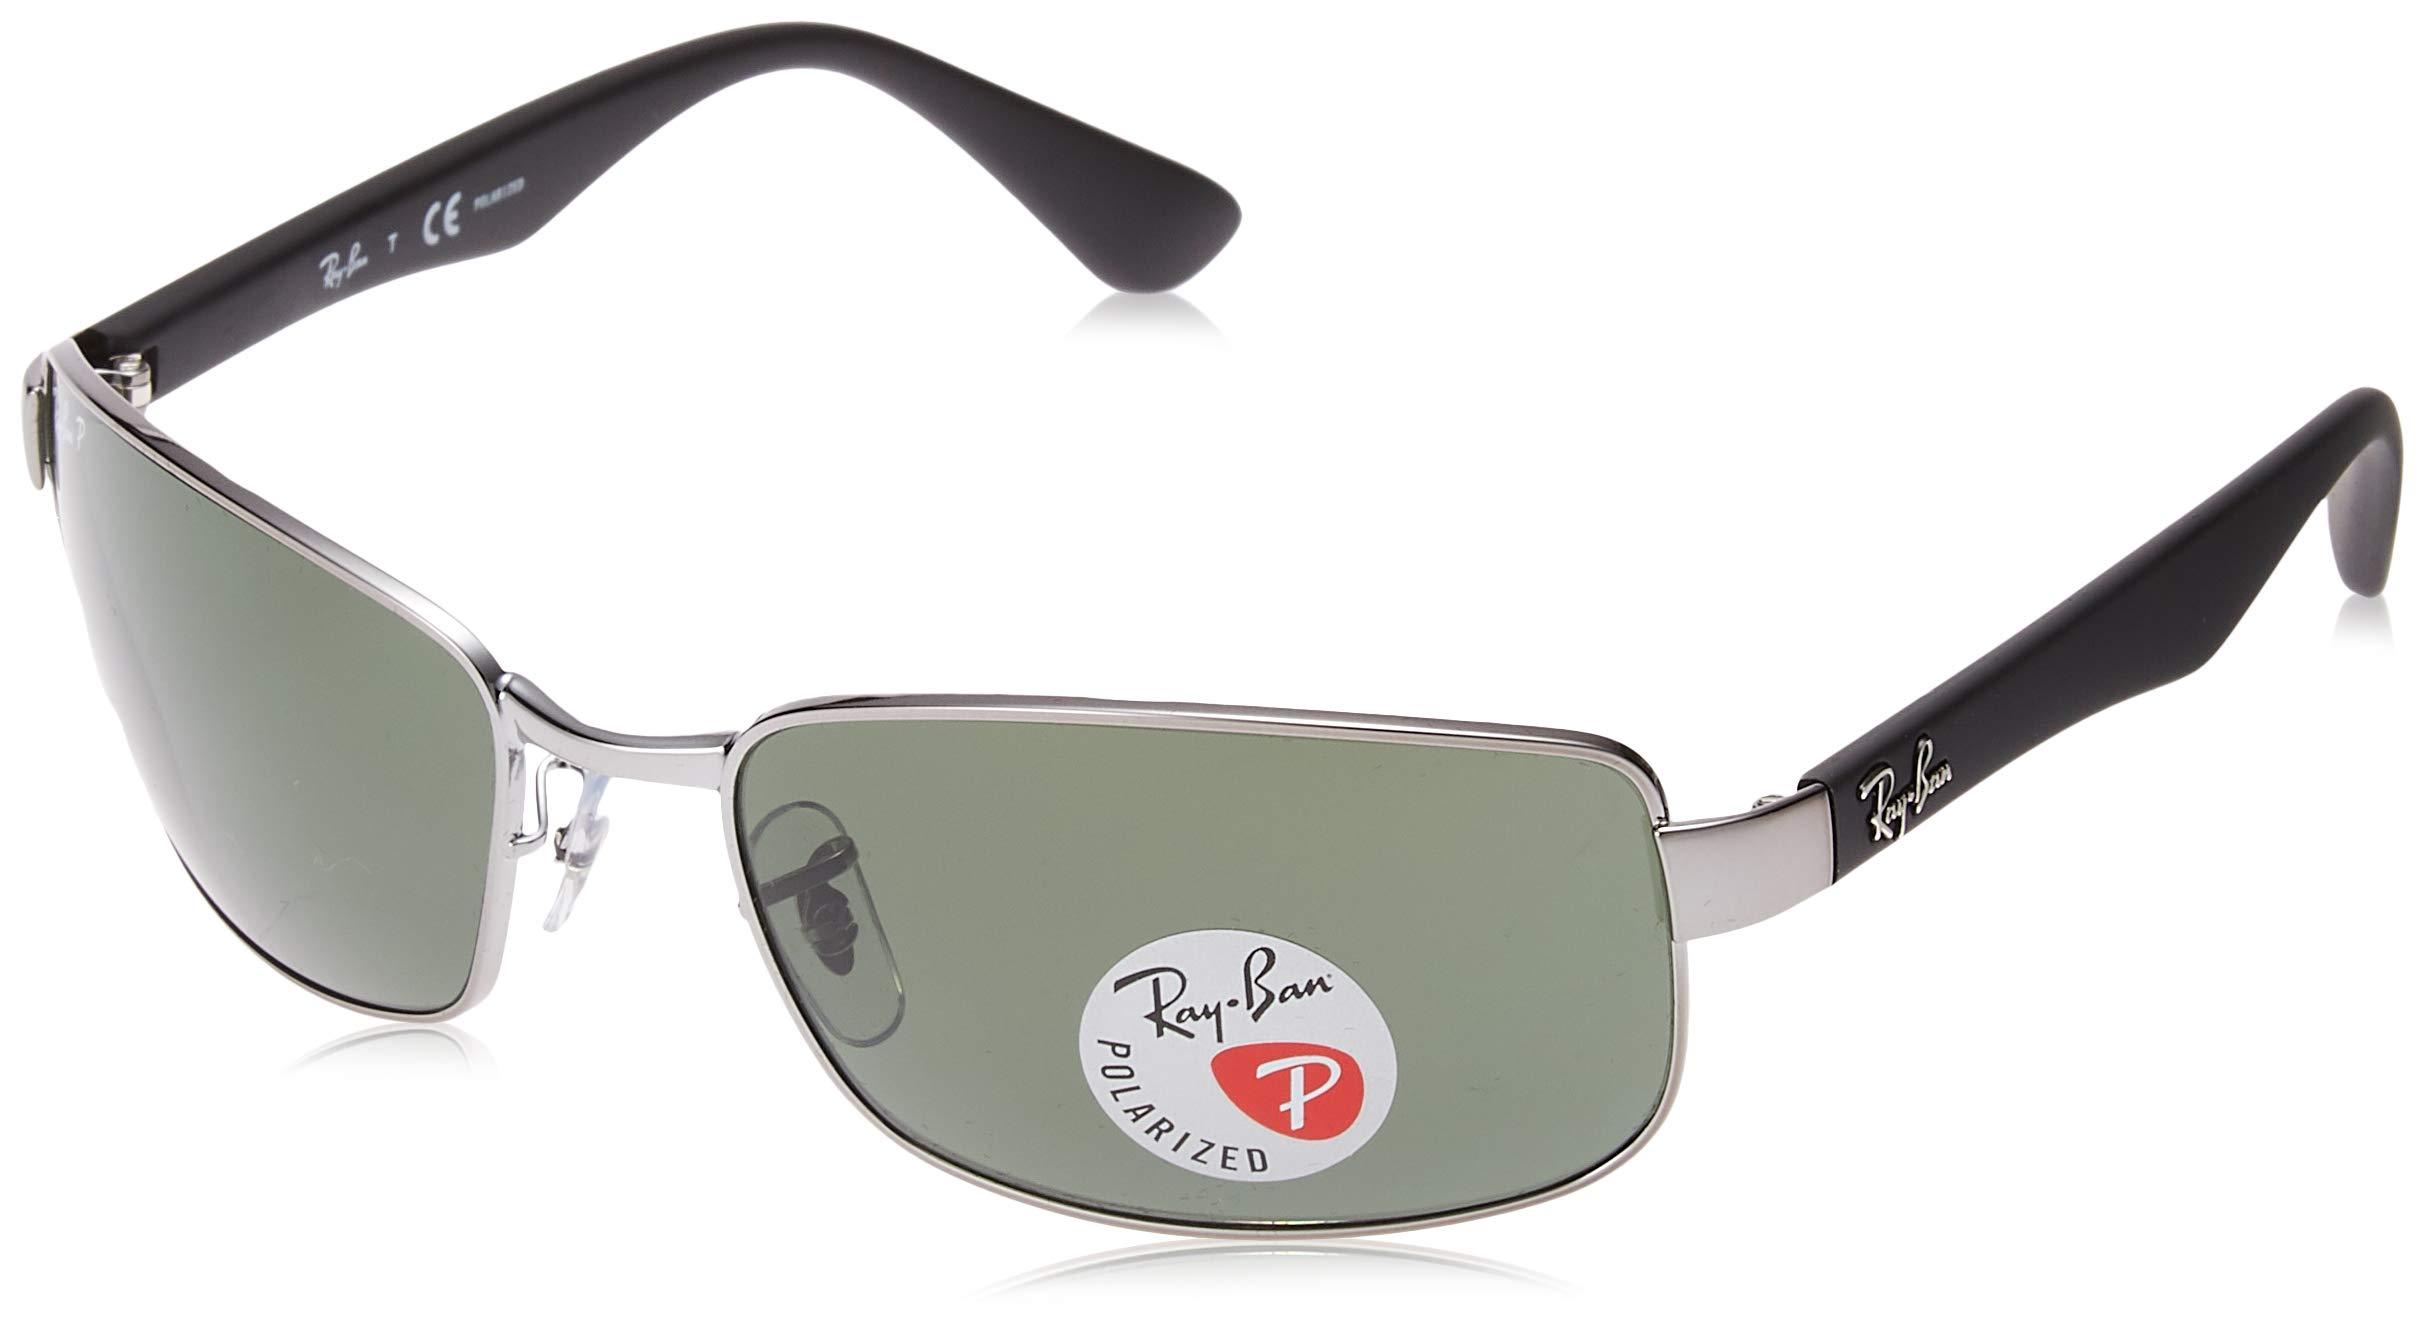 RAY-BAN RB3478 Polarized Rectangular Sunglasses, Gunmetal/Polarized Green, 60 mm by RAY-BAN